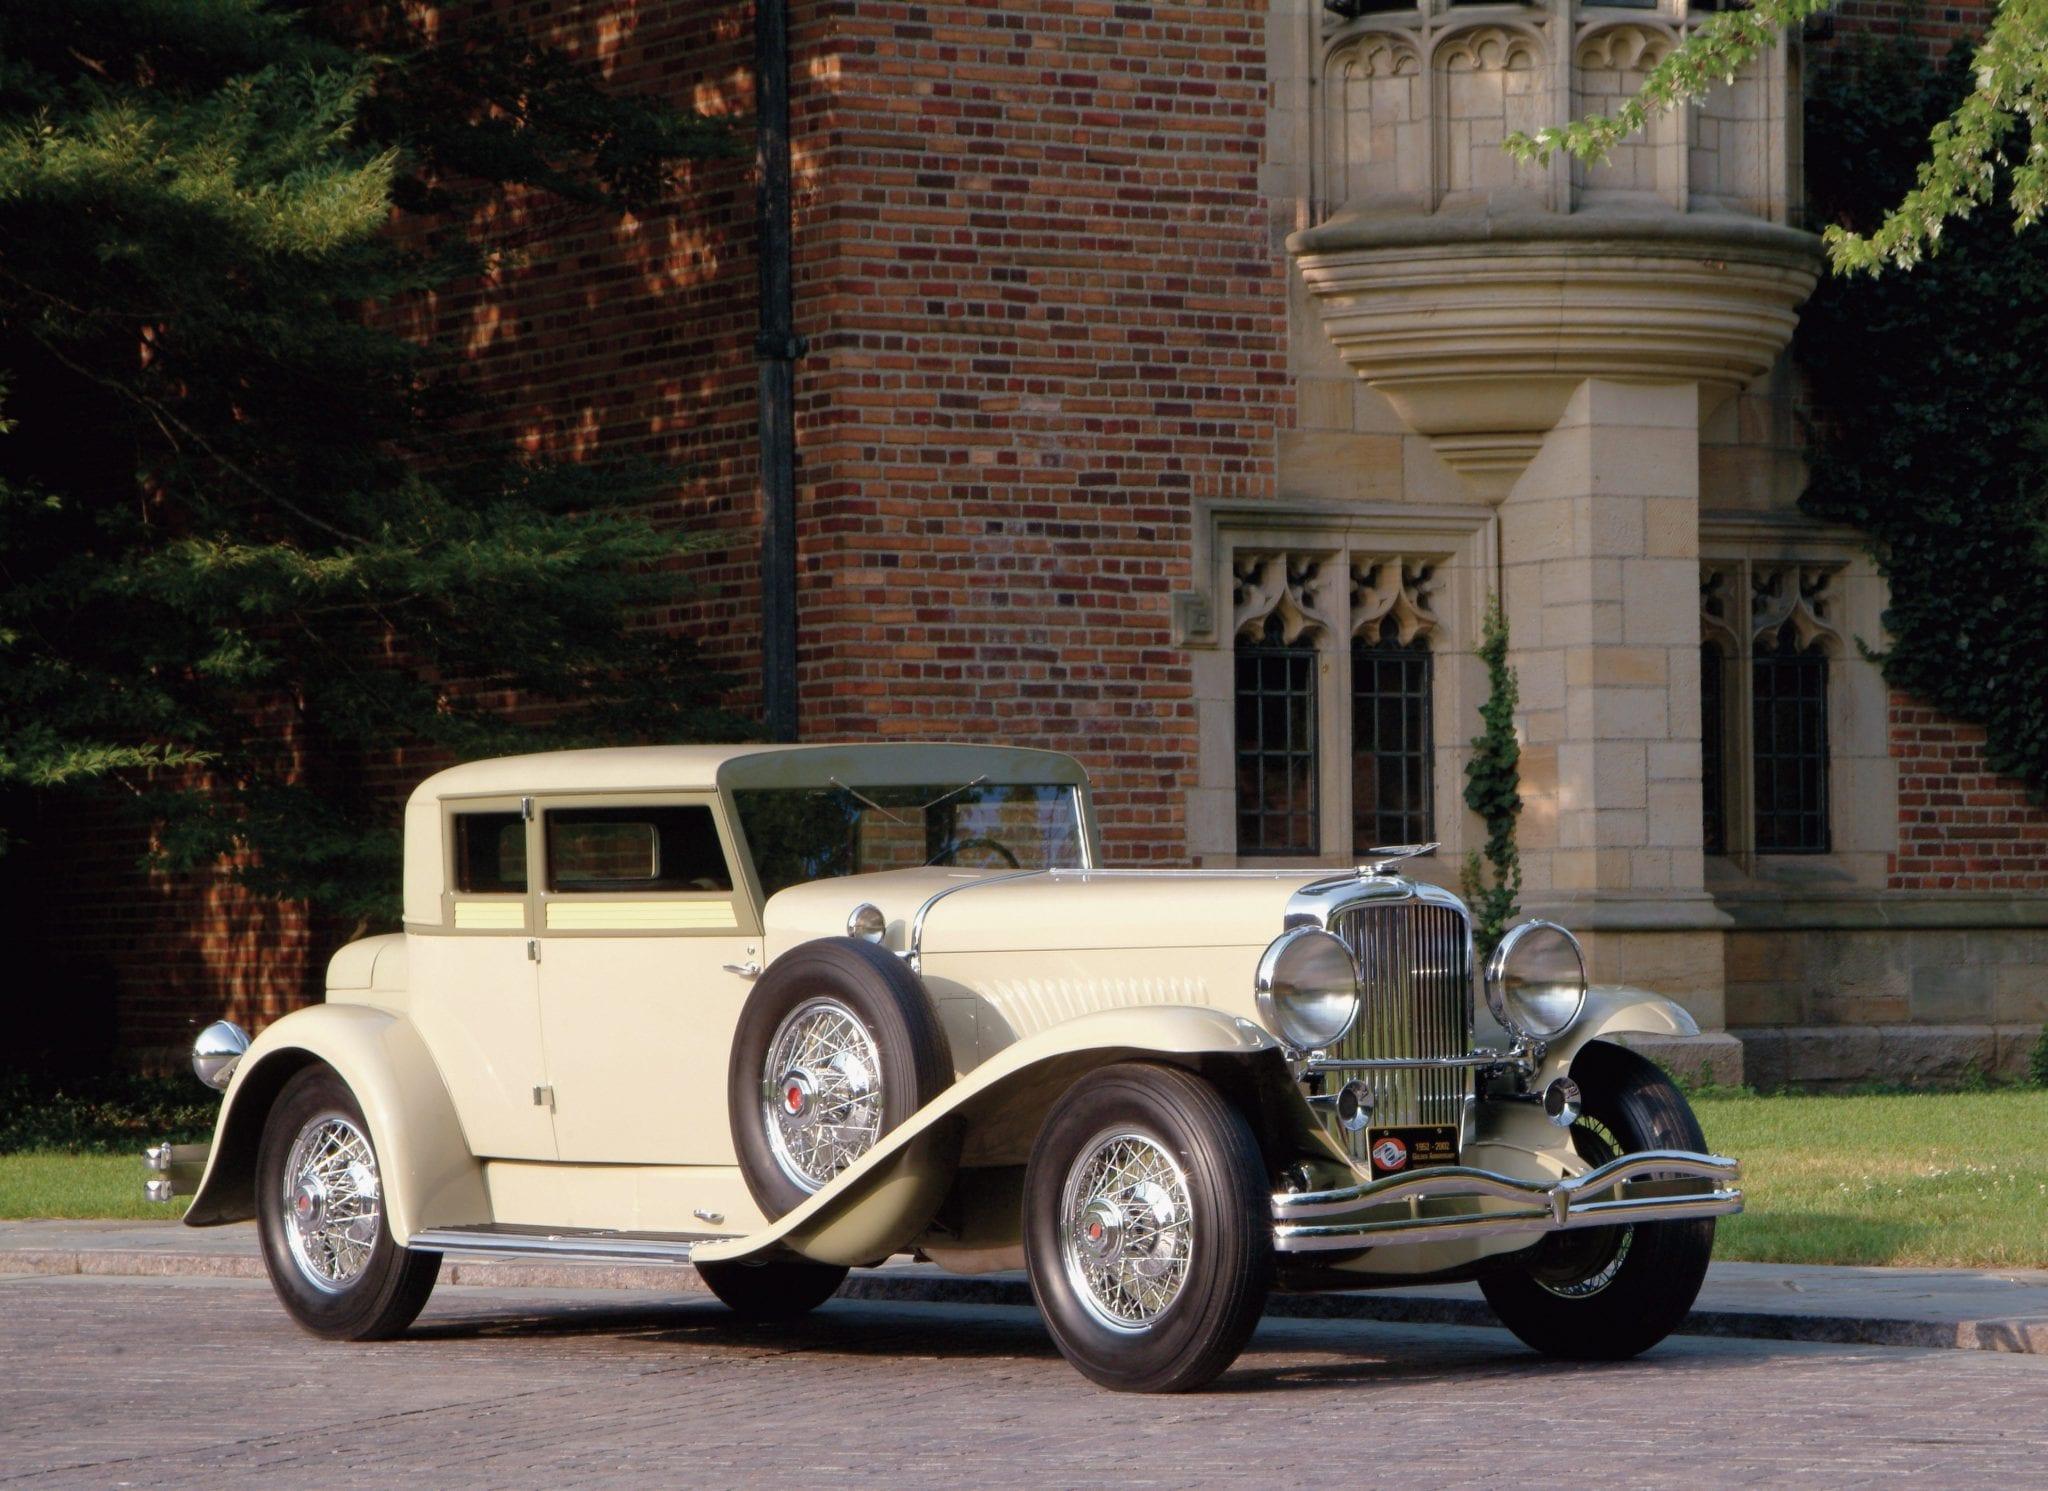 1932 Duesenberg Model J Victoria Coupe